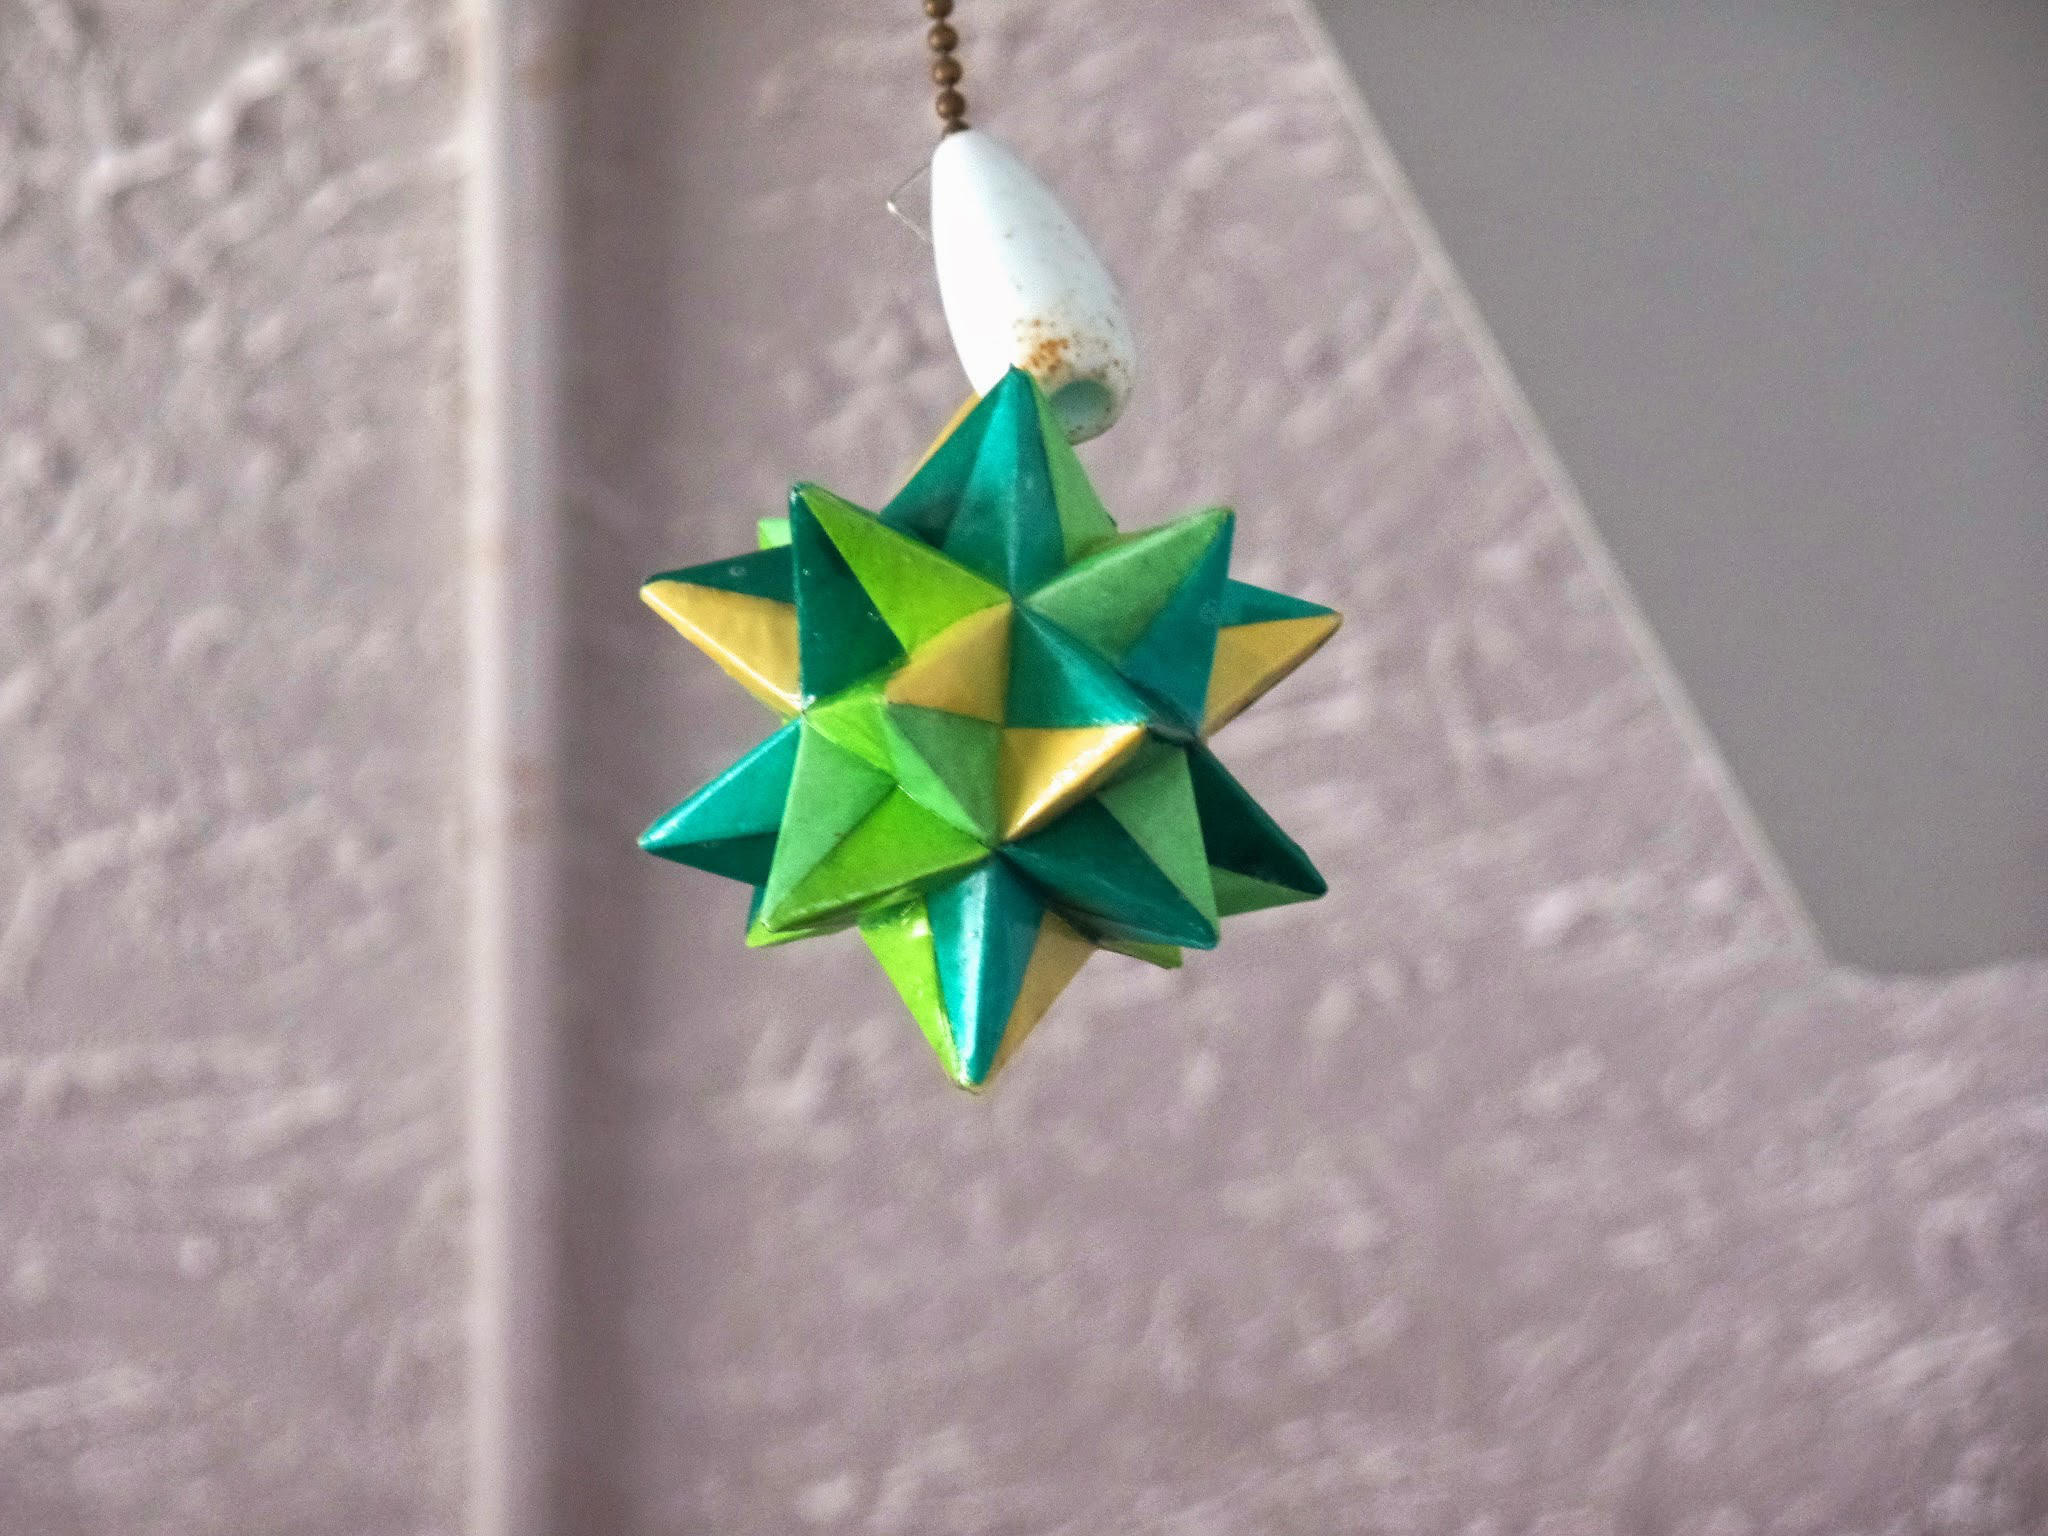 Origami Modular Star in Polycrylic by demuredemeanor